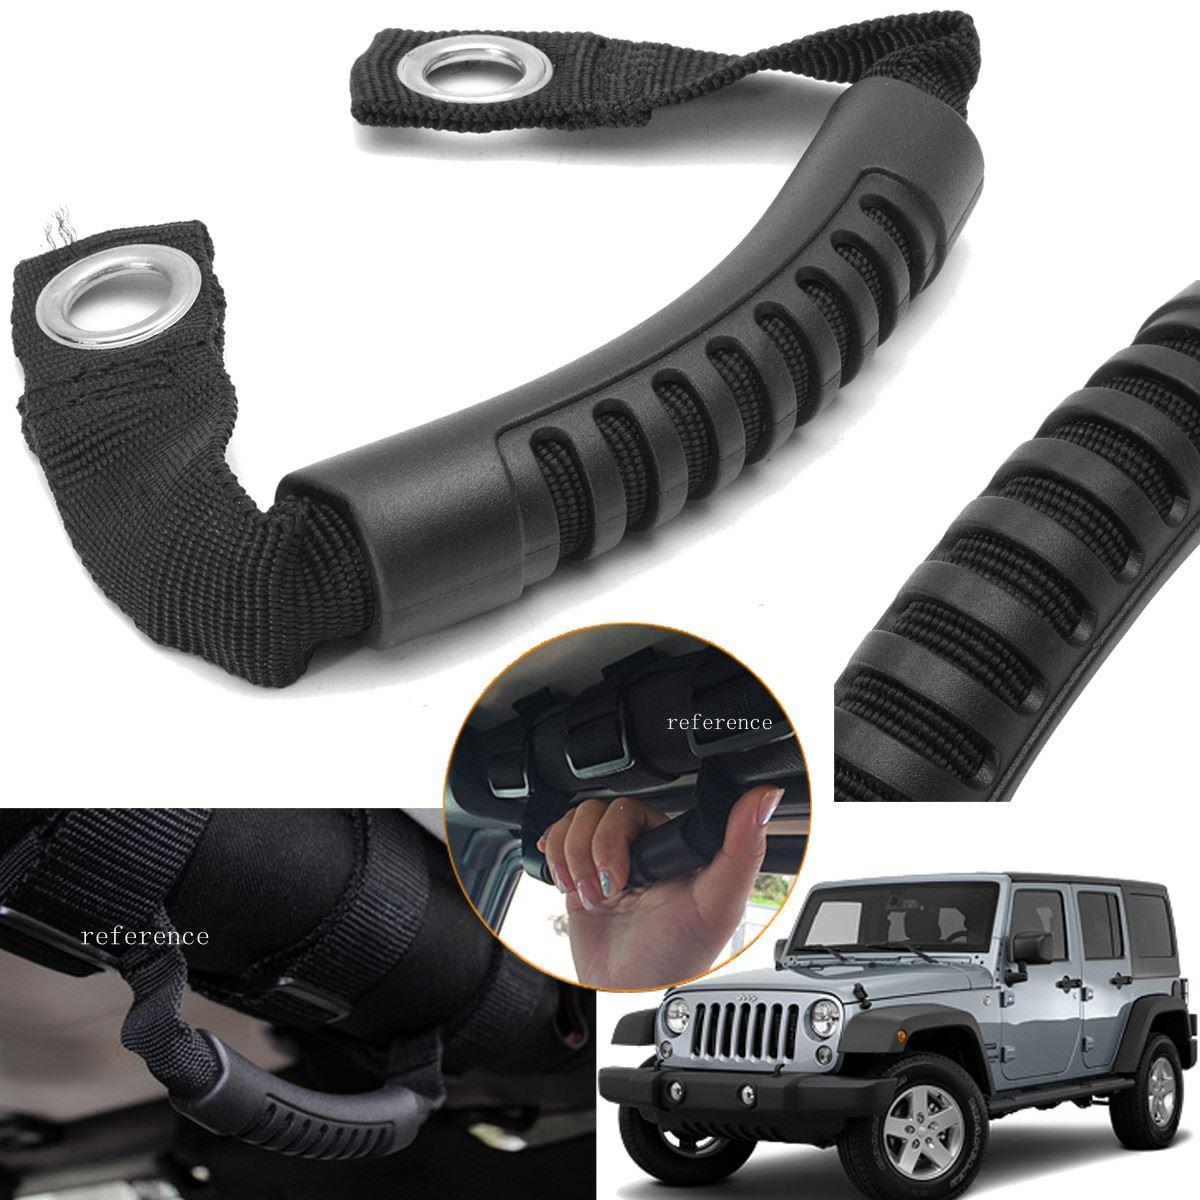 4Pcs Roll Bar Grab Handles Hook Black For Jeep Wrangler CJ YJ TJ JK USA Stock US